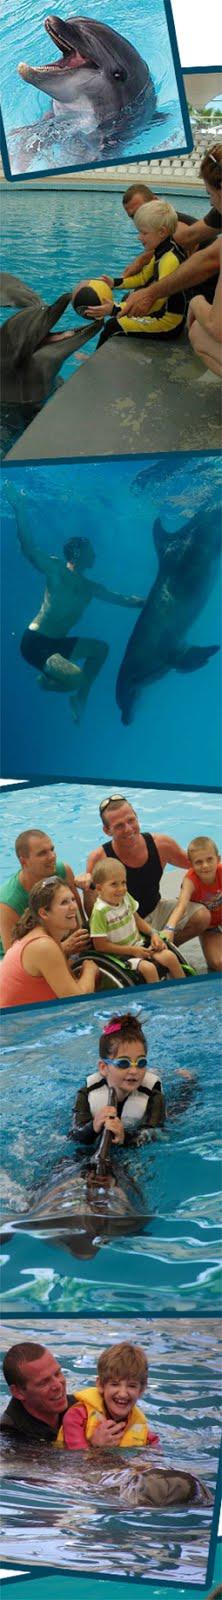 Z delfinoterapie